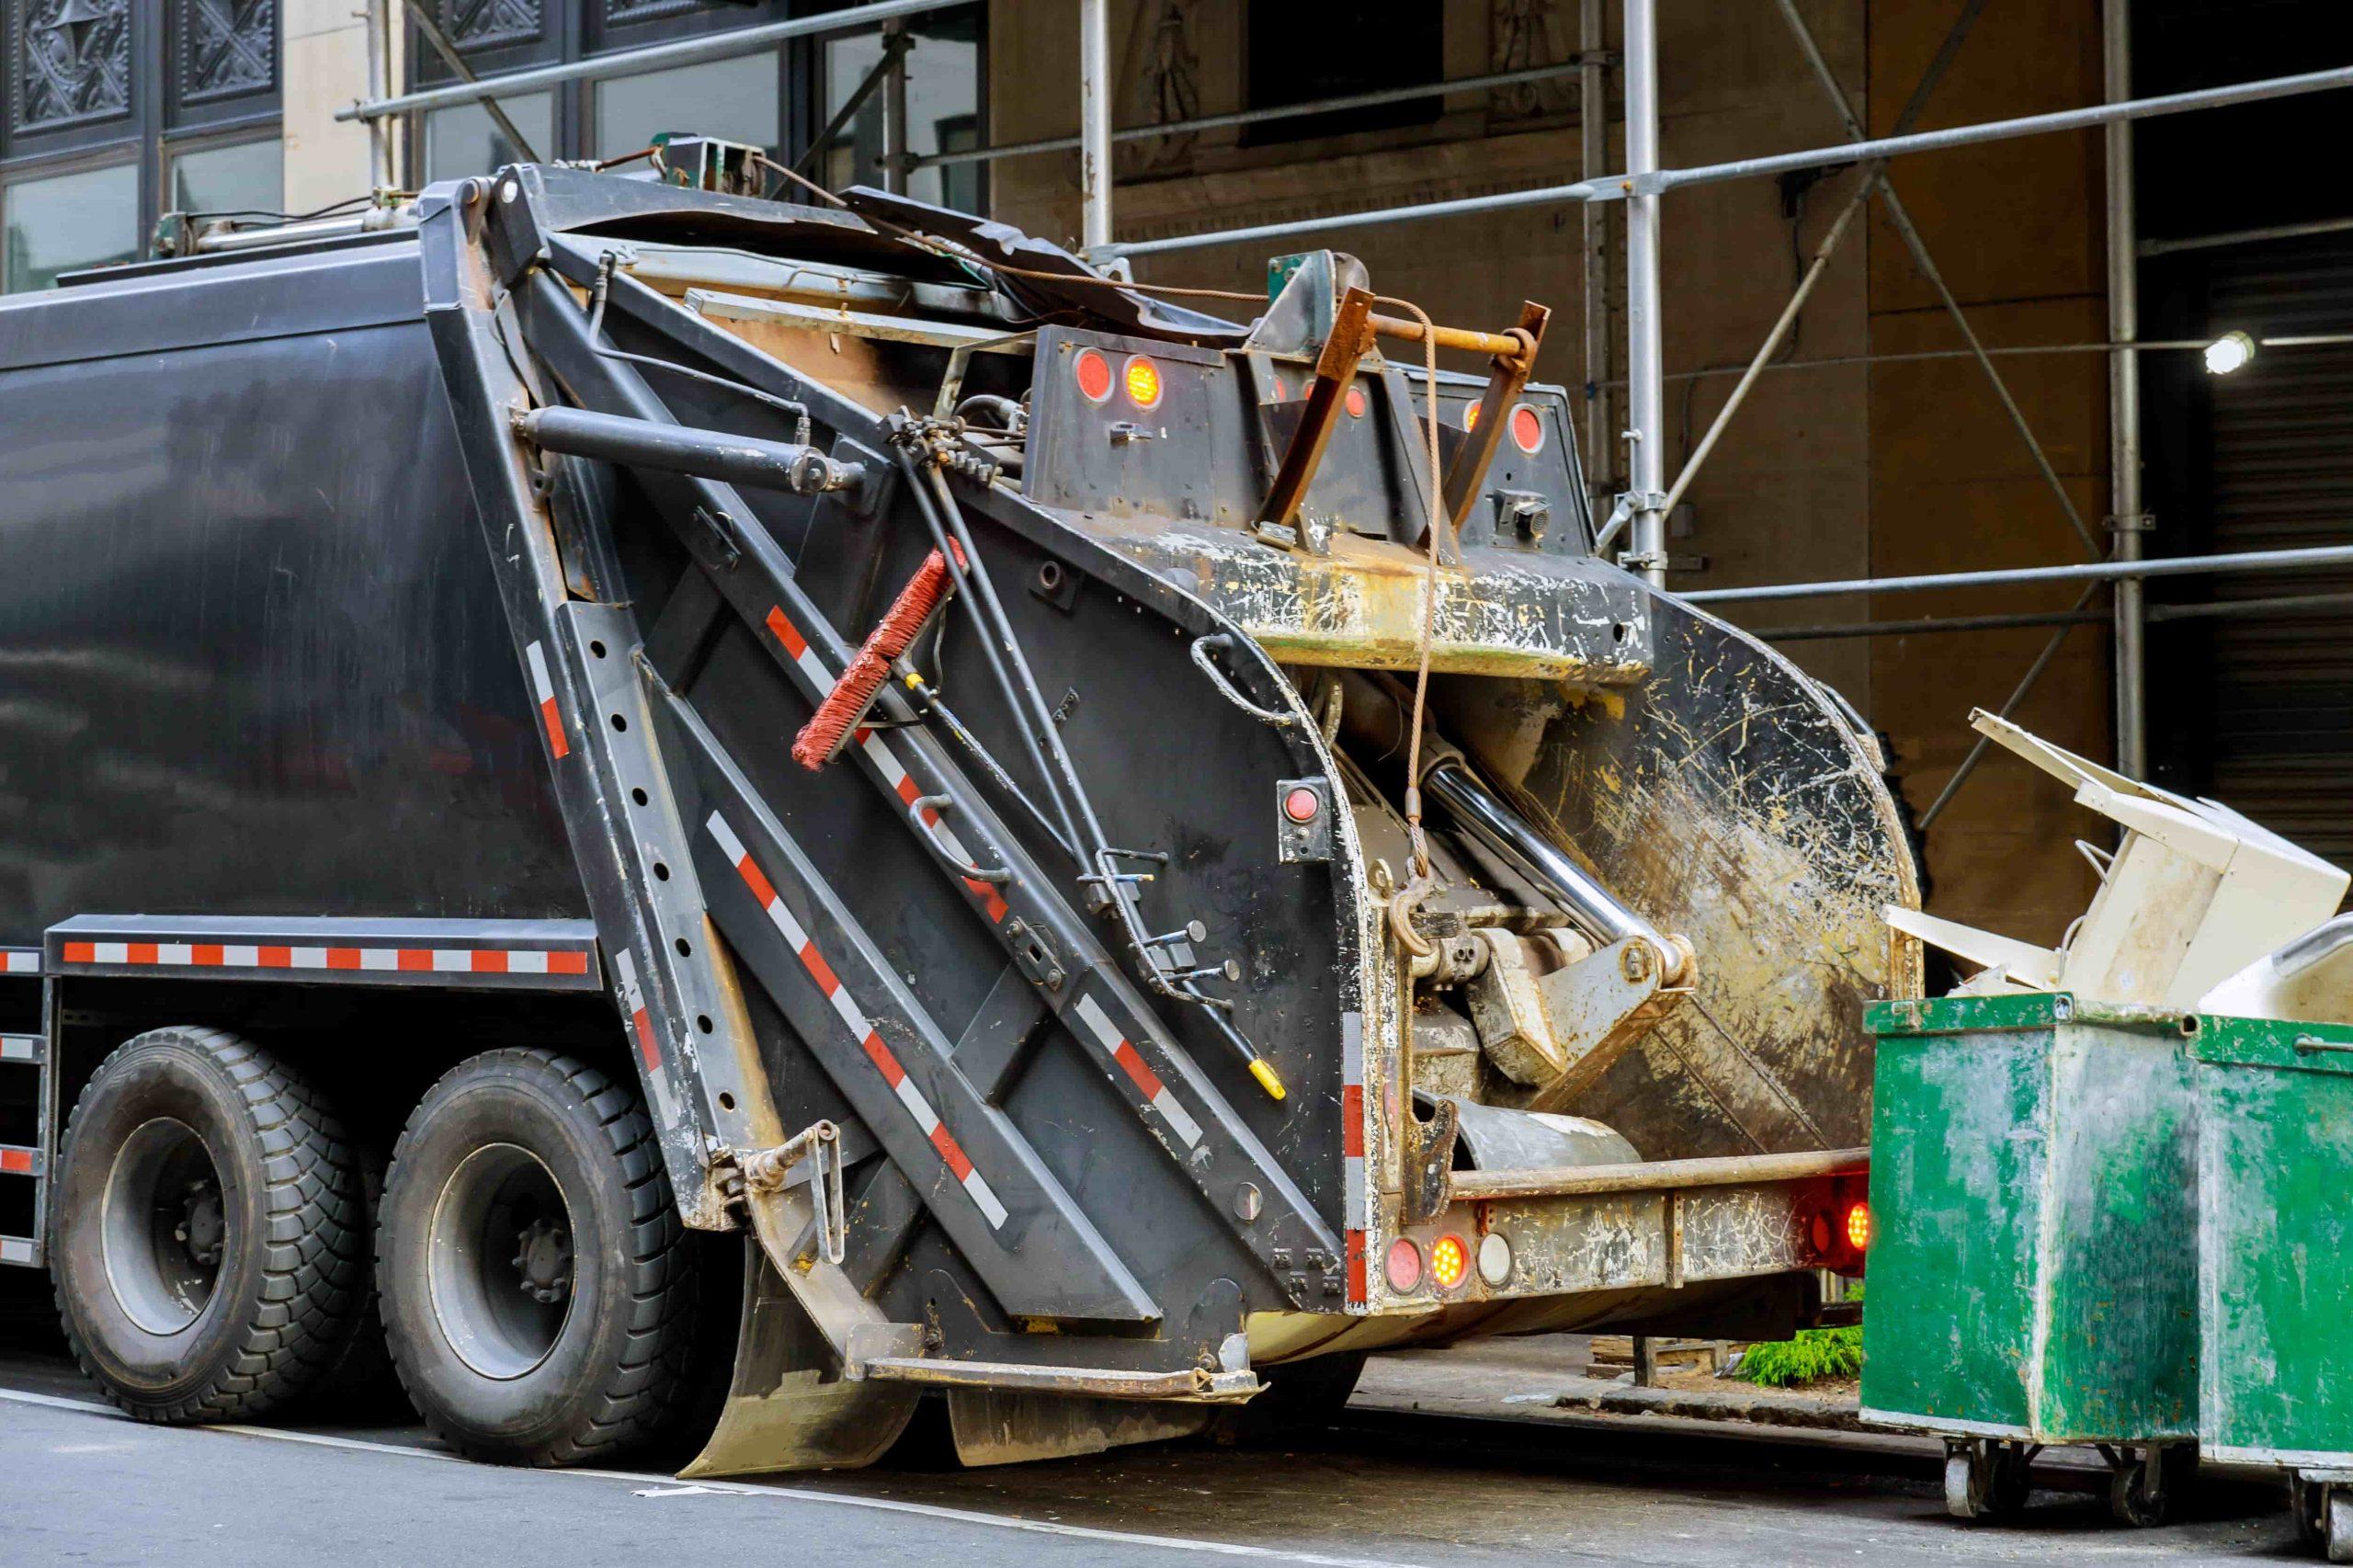 Smart city waste management